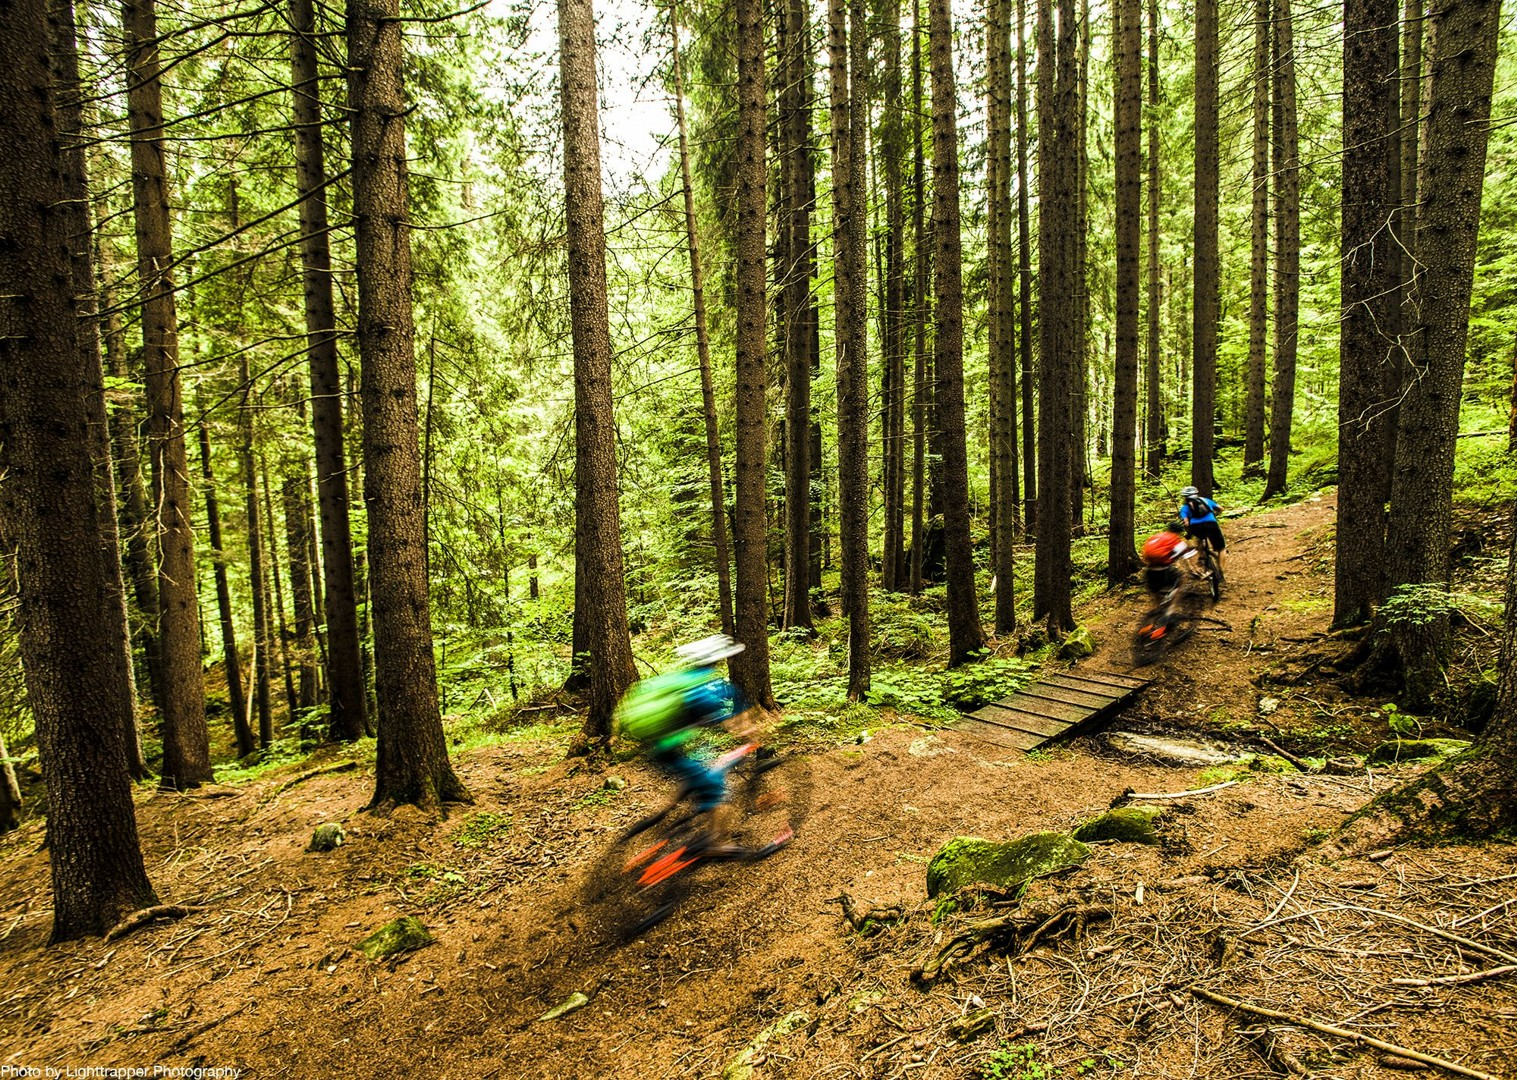 saddle_skedaddle_italy_2017_day6_brenta_dolomites_162-2.jpg - Italy - Dolomites of Brenta - Guided Mountain Bike Holiday - Mountain Biking